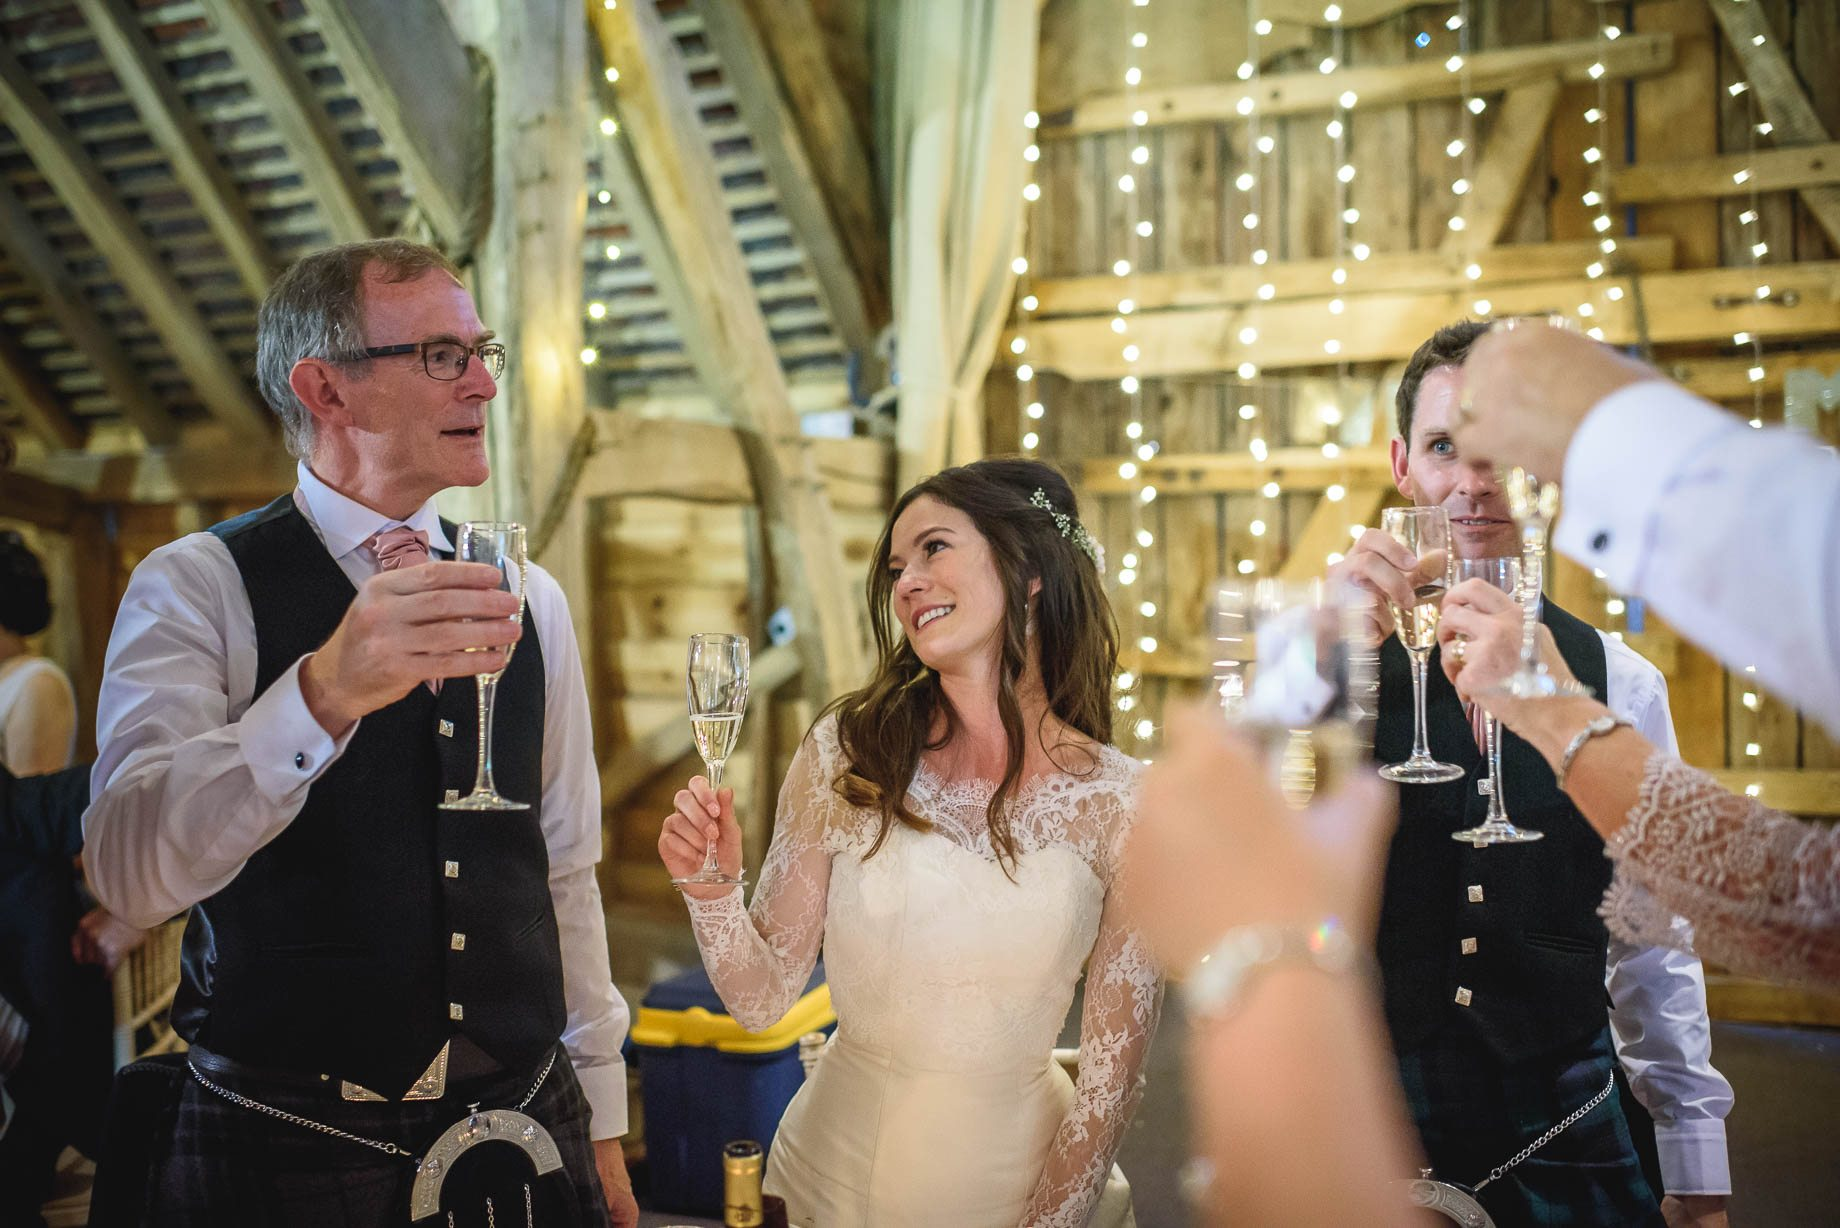 Gildings Barn wedding photography - Sarah and Steve (148 of 190)